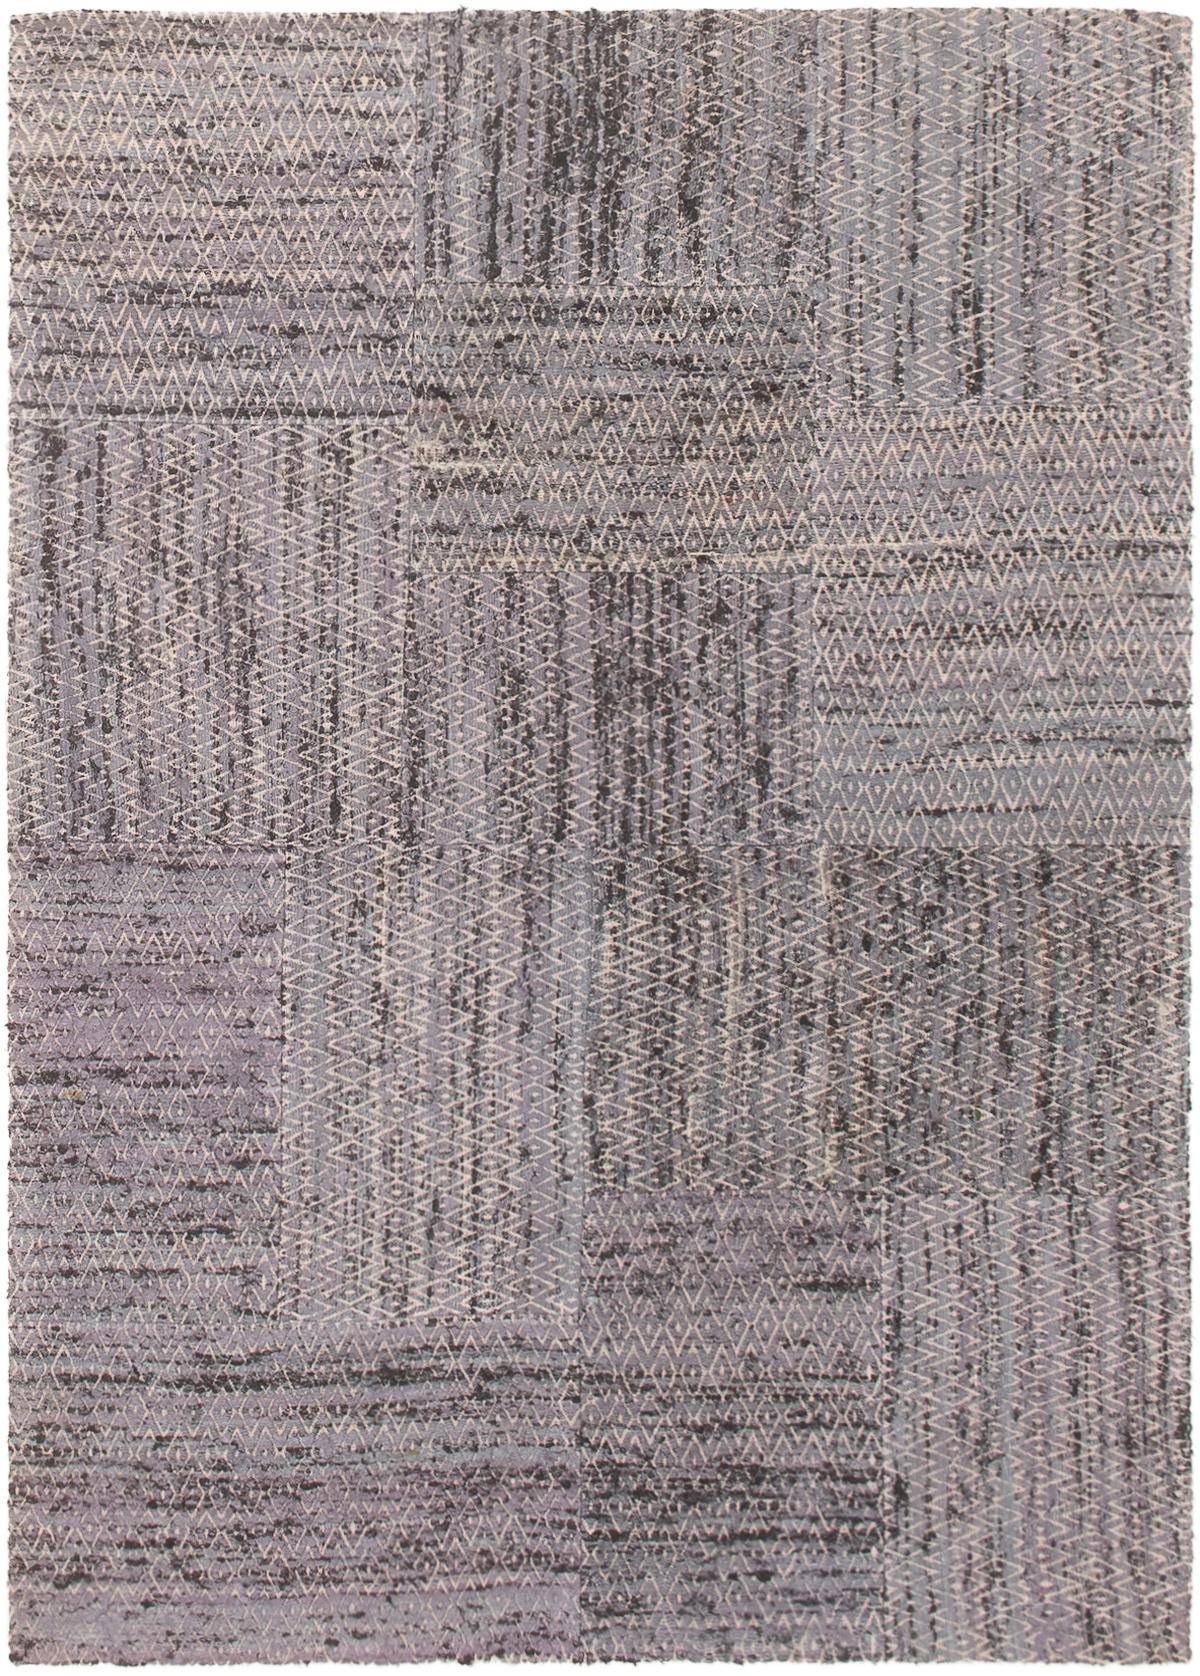 "Handmade Collage Denim Blue Chenille Rug 4'7"" x 6'7"" Size: 4'7"" x 6'7"""